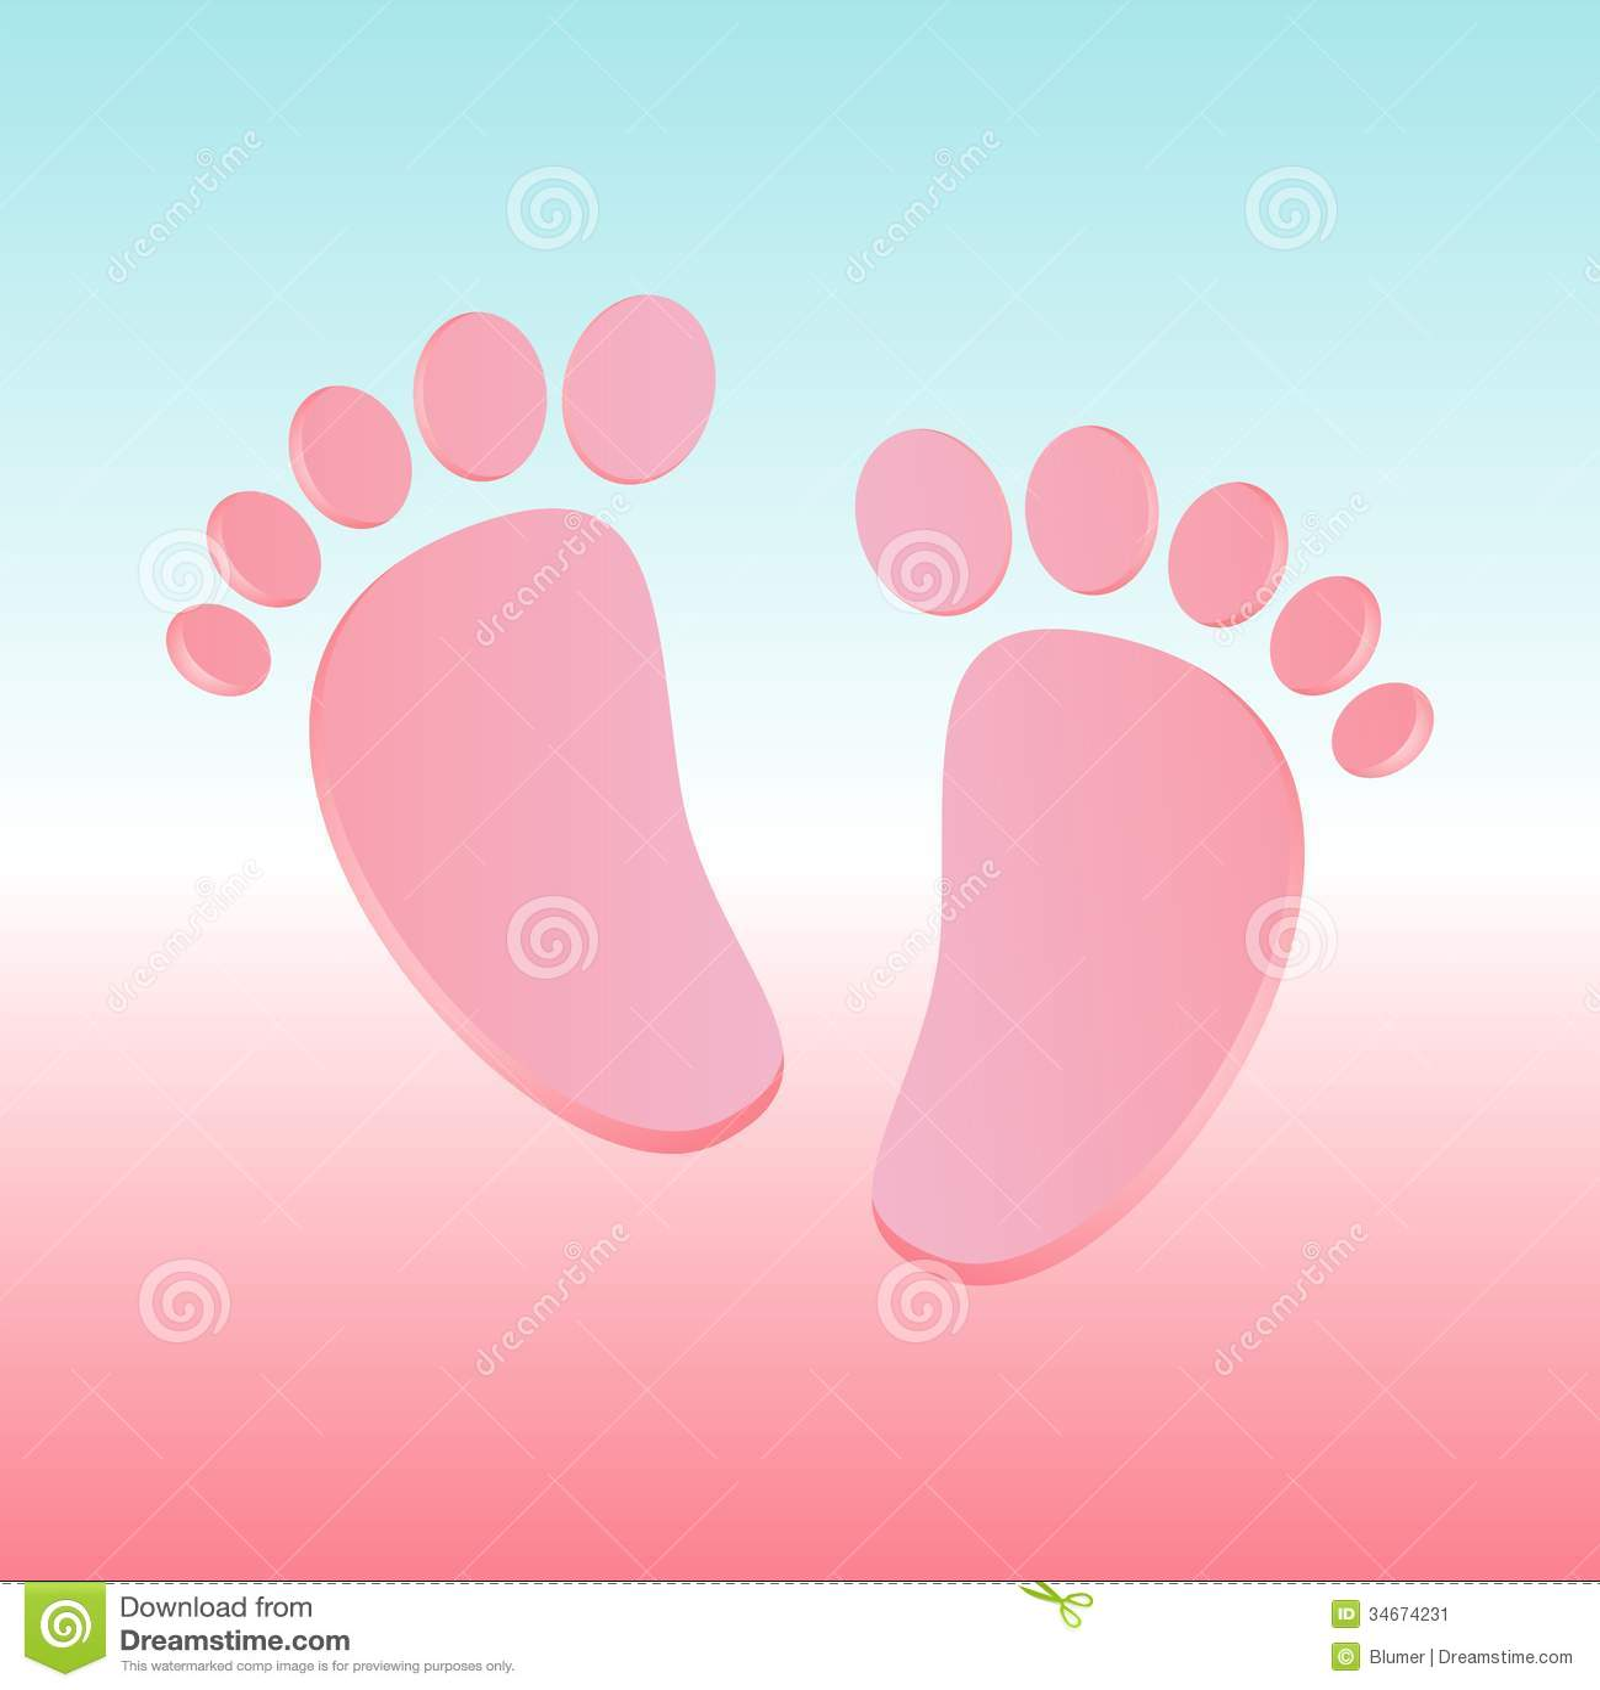 baby shower design stock image image 34674231